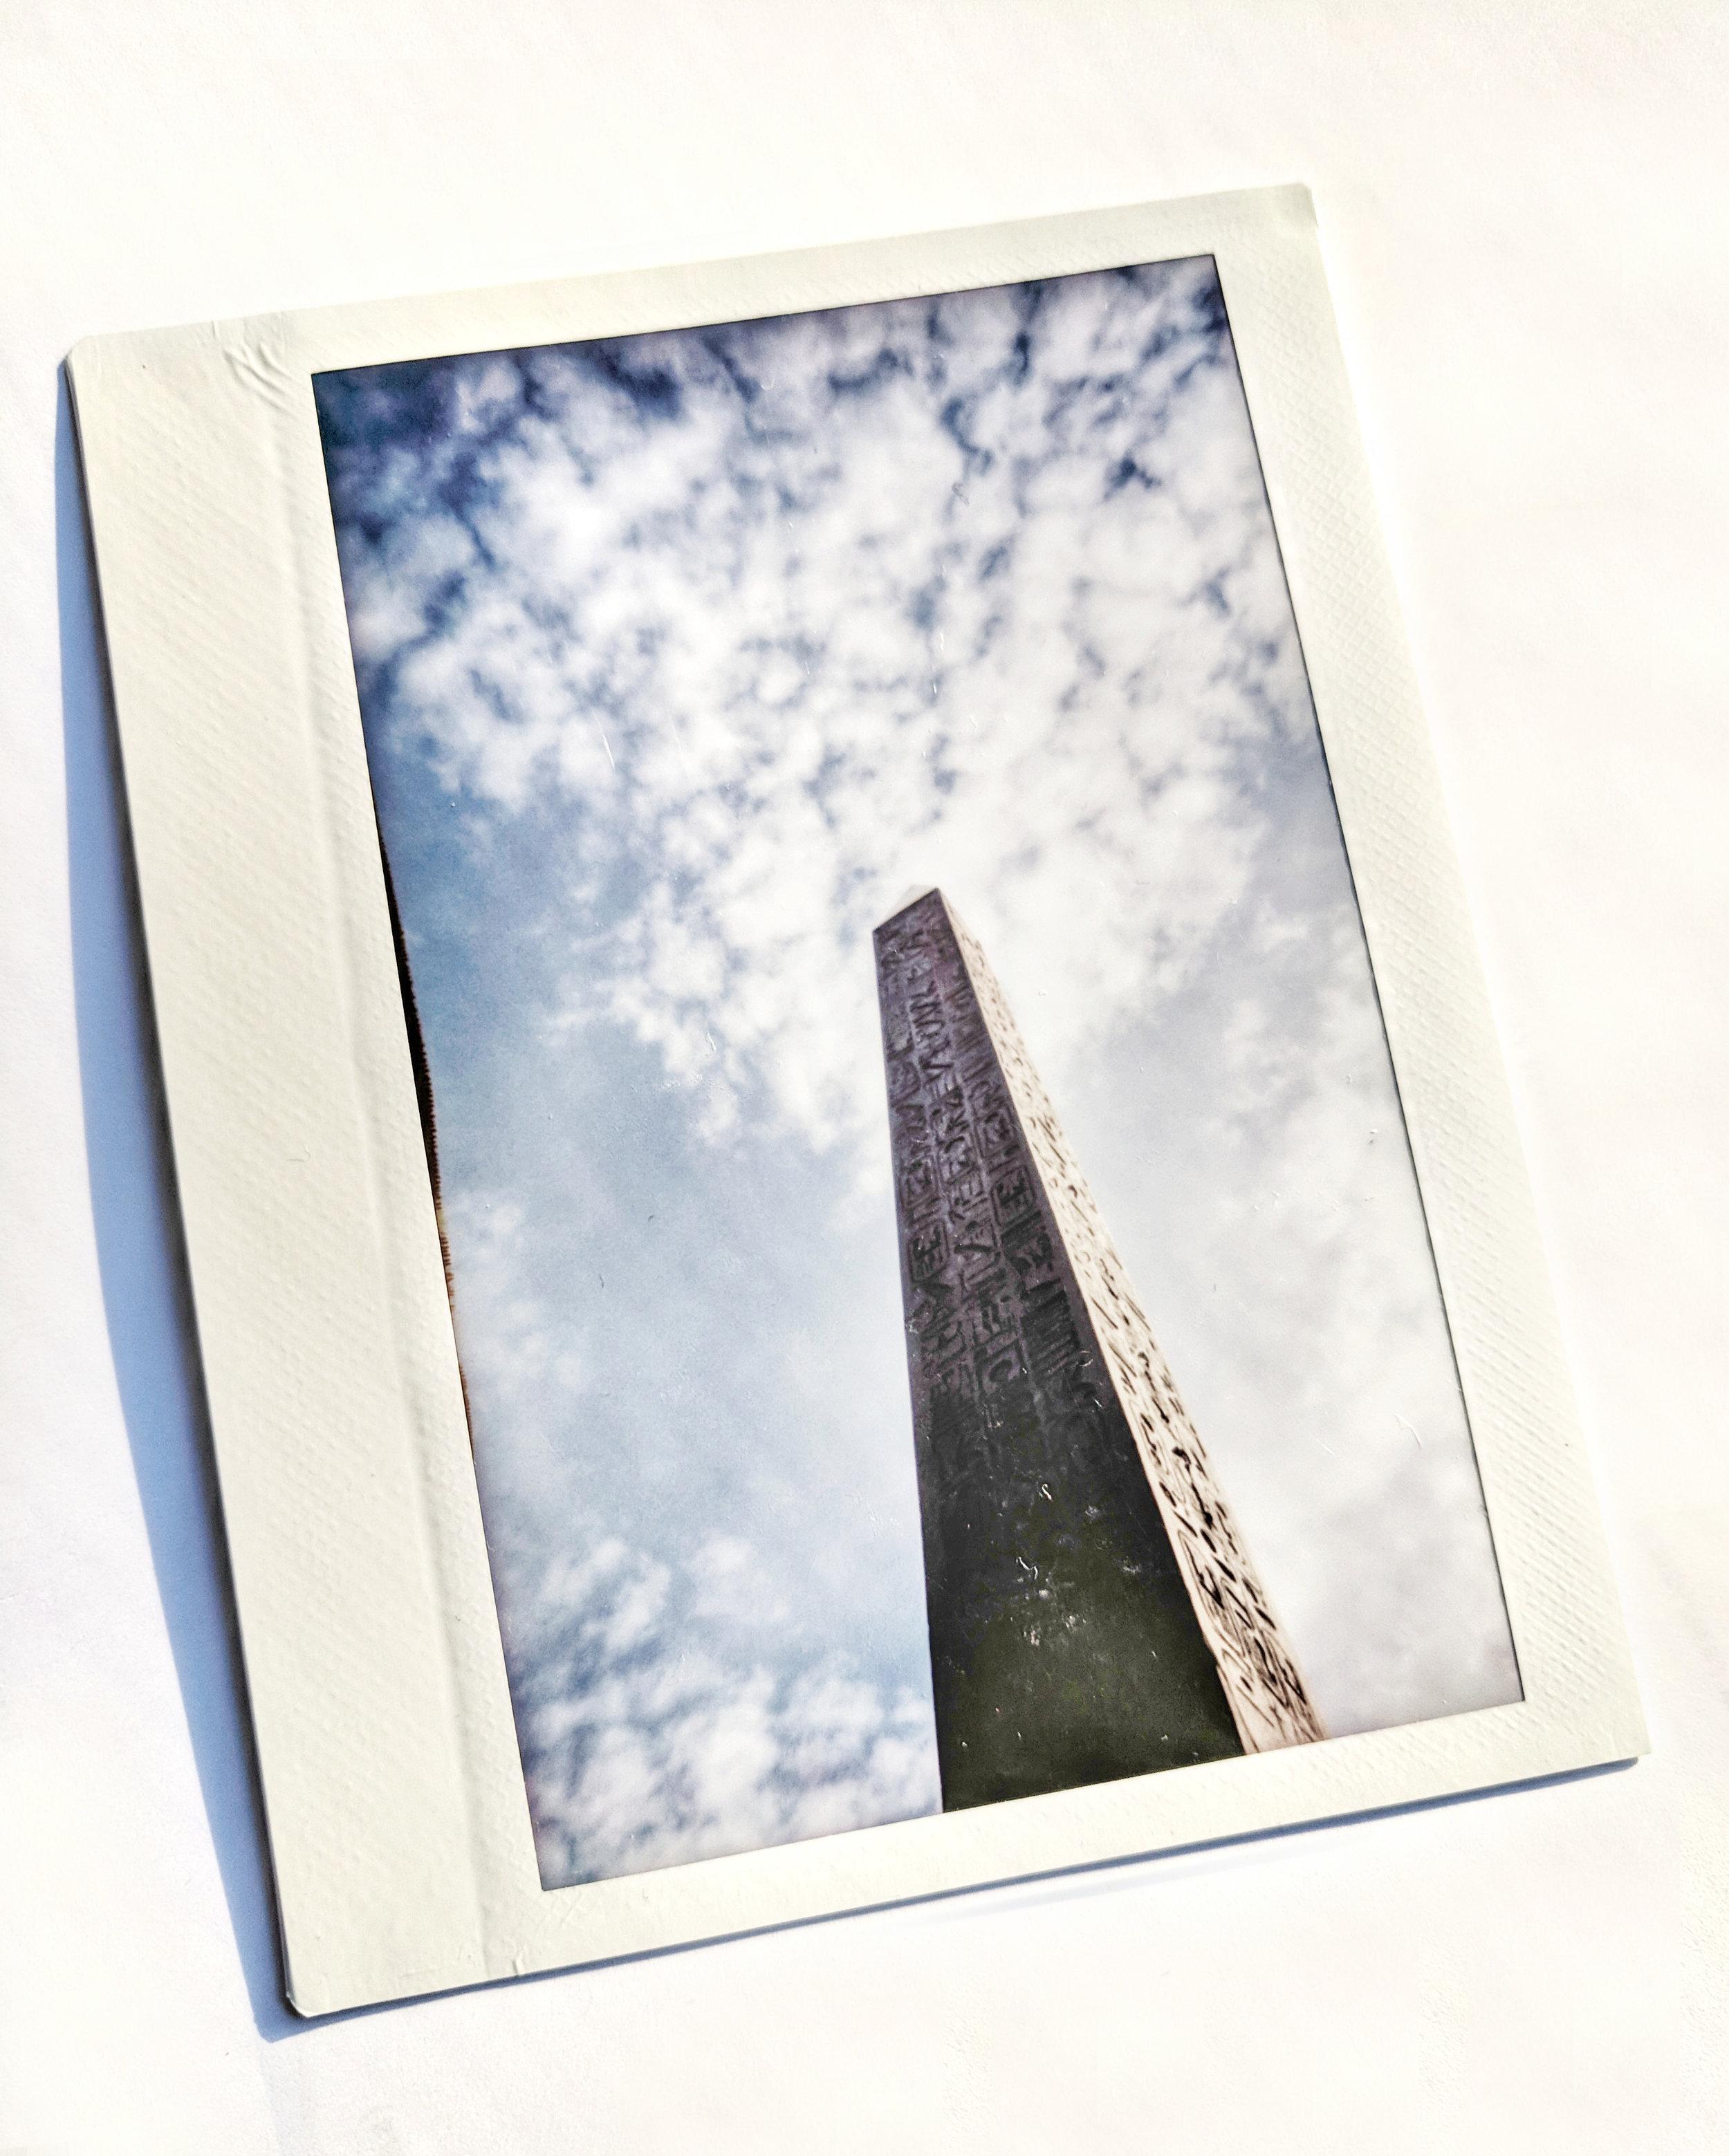 luxor-column-polaroid.jpg